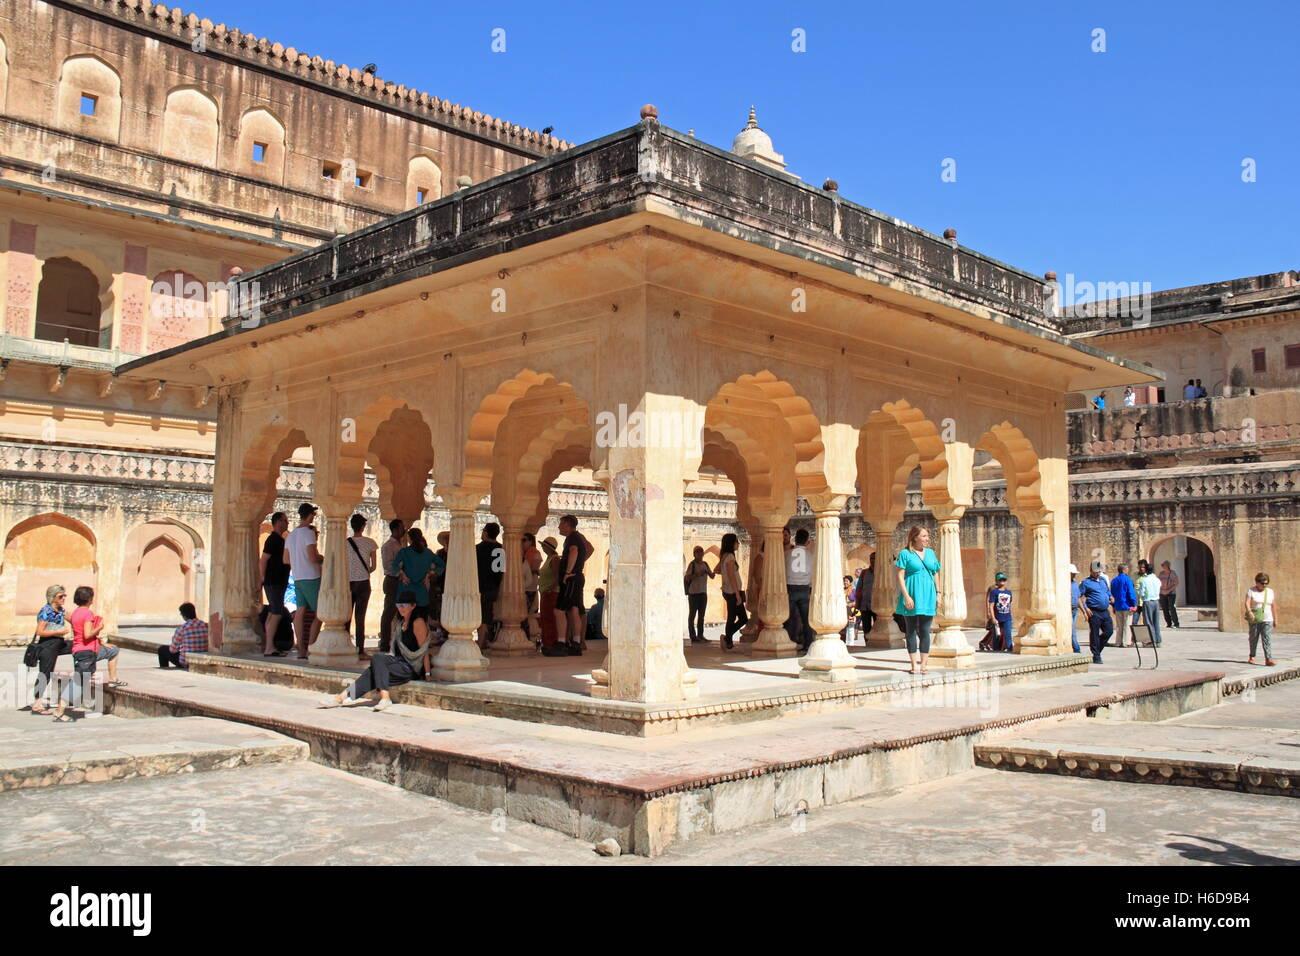 Baradari pavilion zenani deorhi amer or amber fort for Decor india jaipur